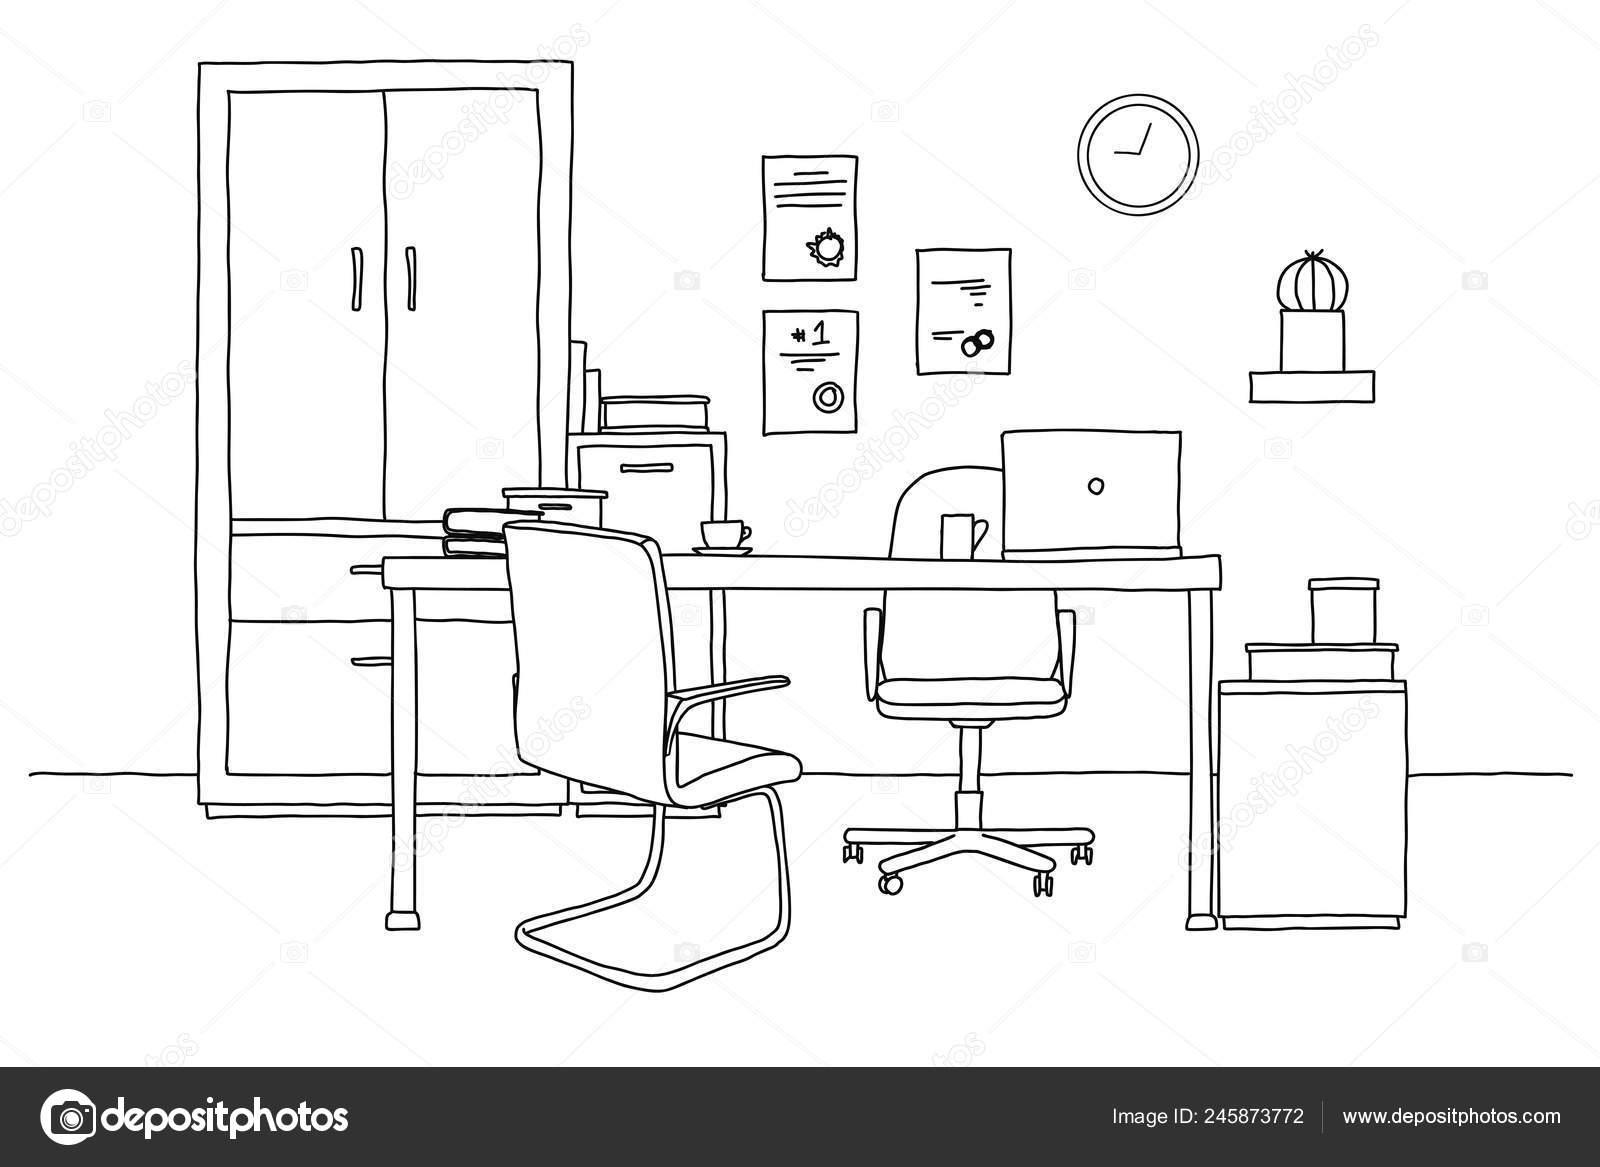 Varios Escritorio Boceto Sobre Habitación Silla Objetos Oficina Mesa 80vmnNw